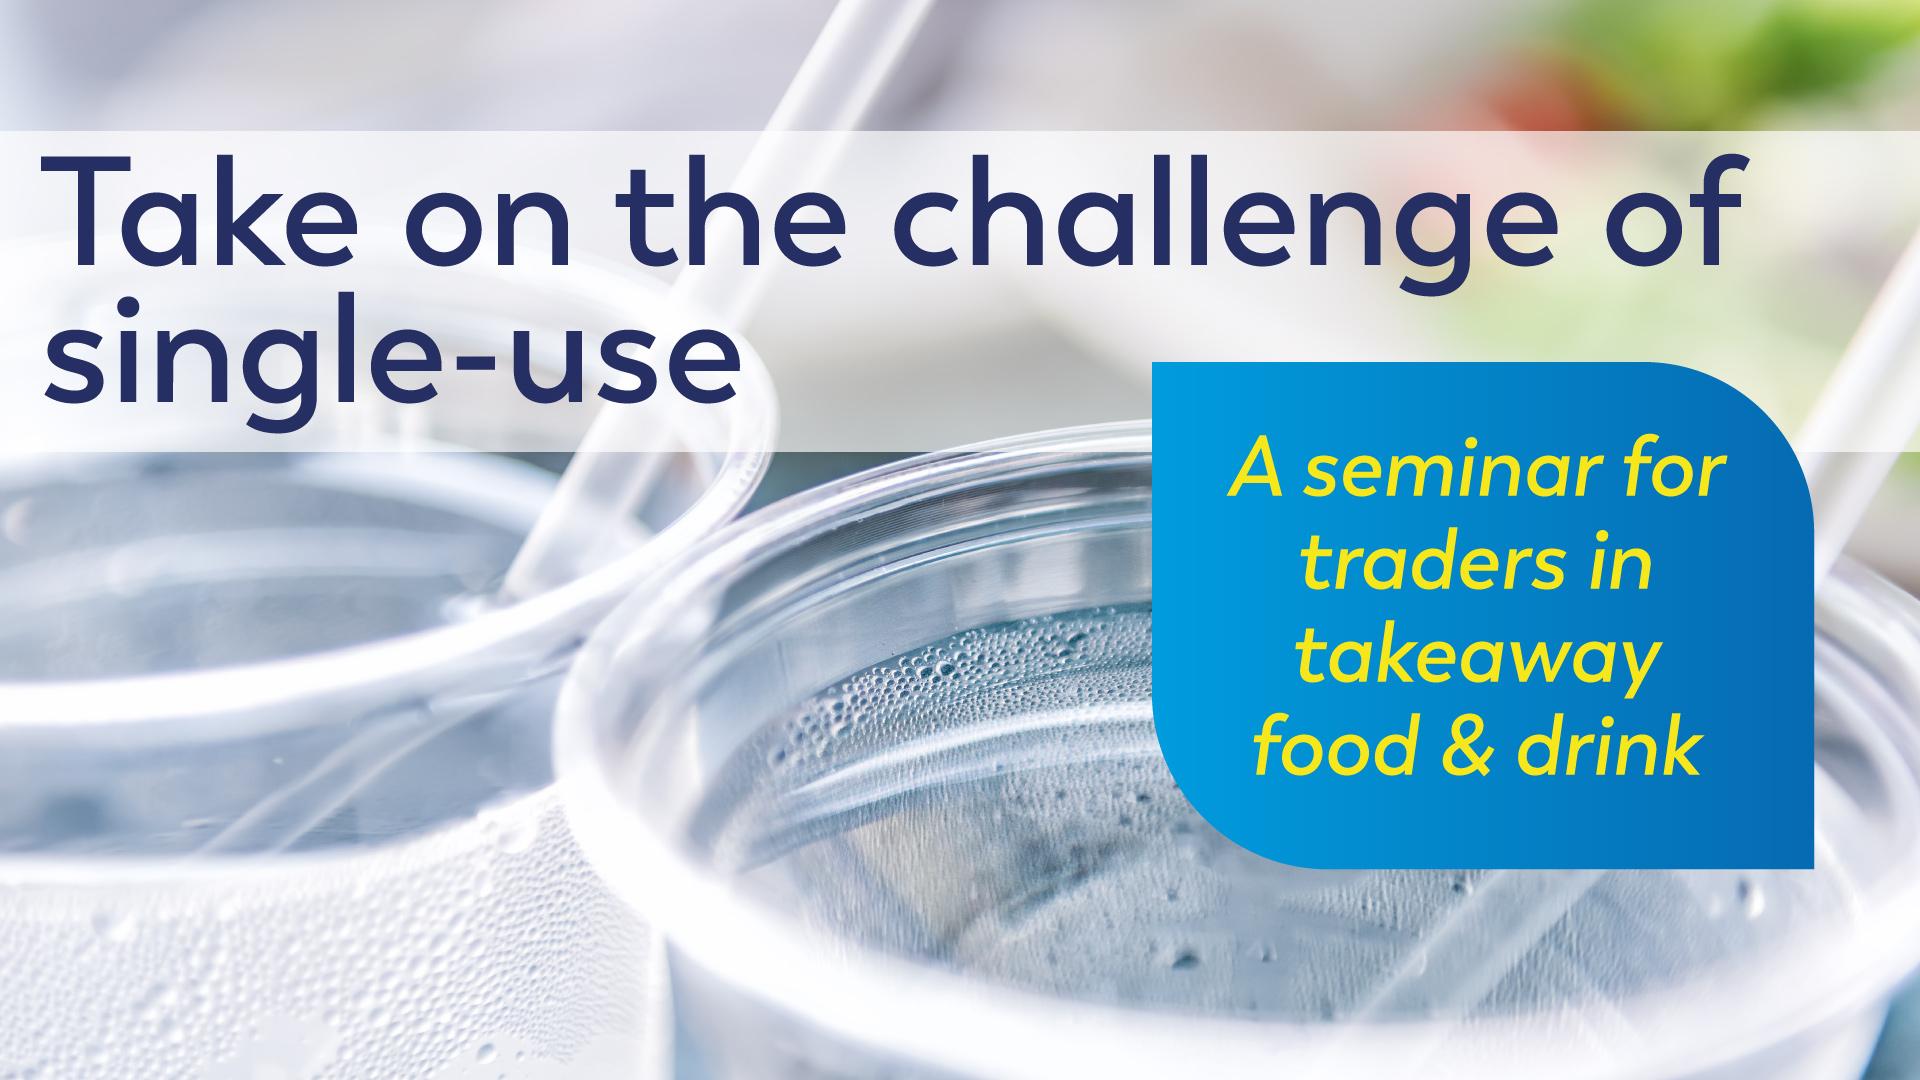 Take on the challenge of single use plastics - seminar